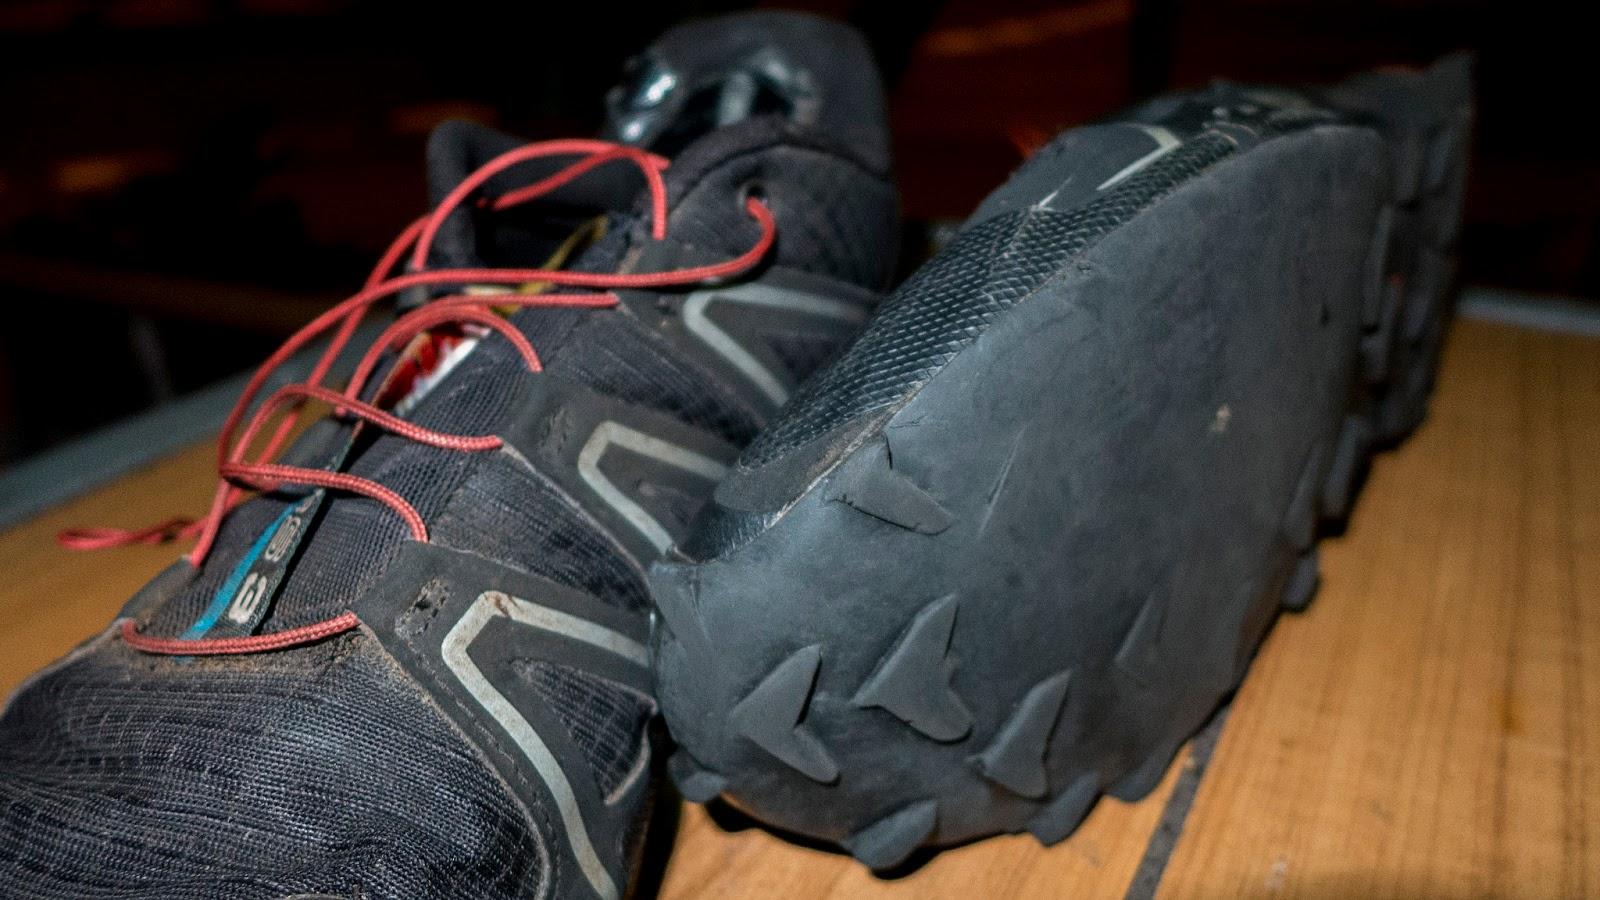 2 pairs of shoes joe ryan